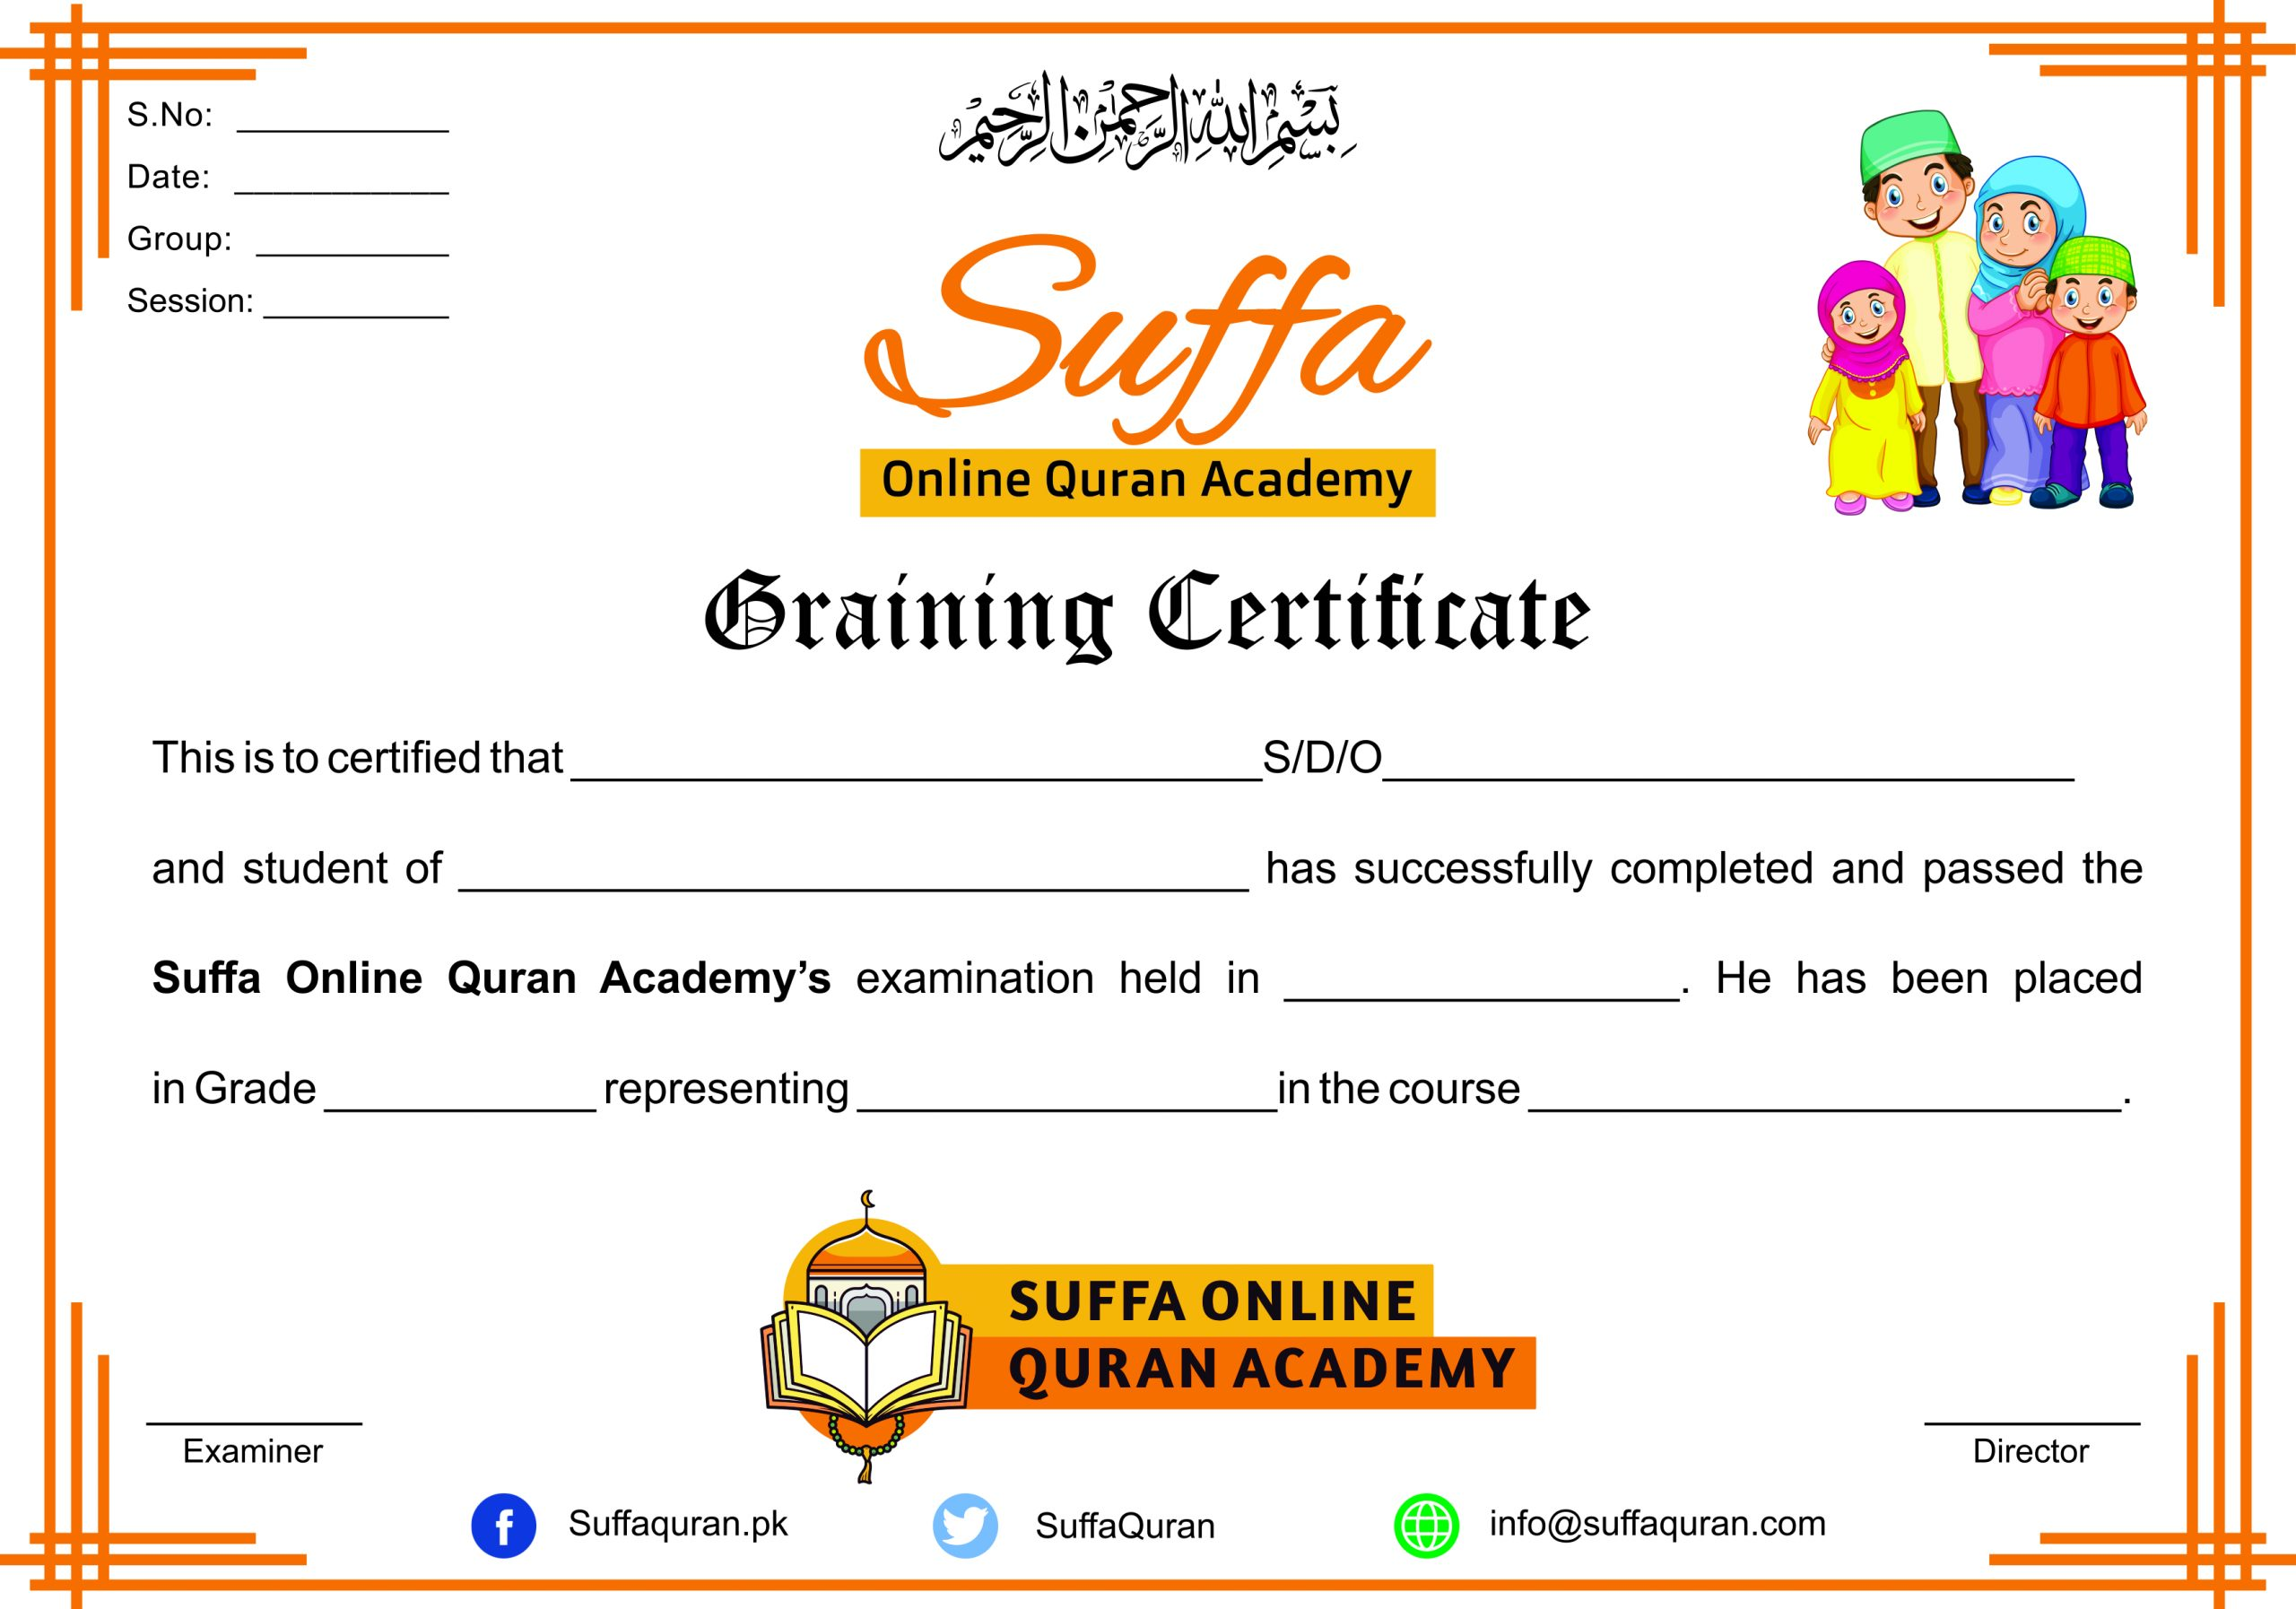 A Graining Certificate